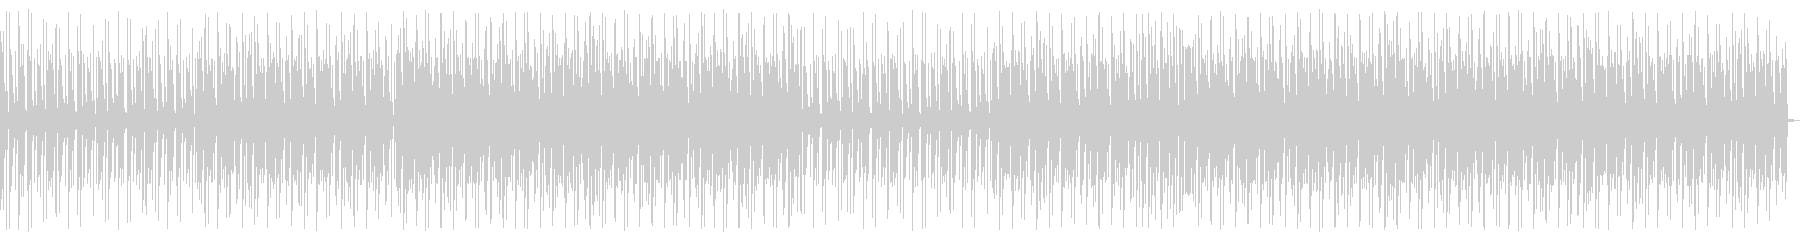 Digital. graphic. Techno_2's unreproduced waveform